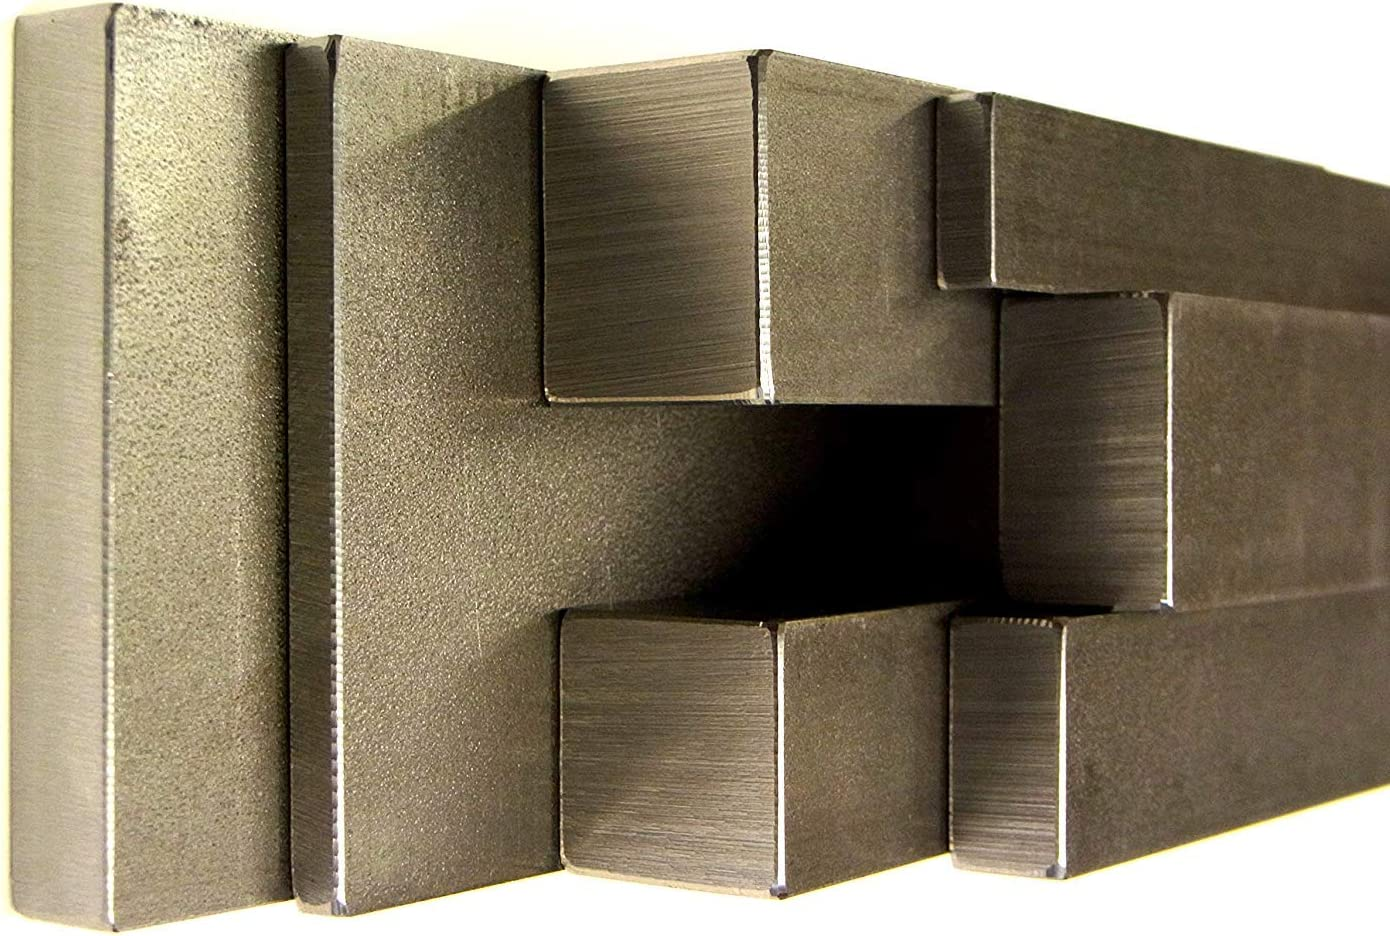 DIN 10278 Flacheisen Bandstahl Flachmaterial Flachstahl S235 JRC+C St37 6x2x500 DIN 10277